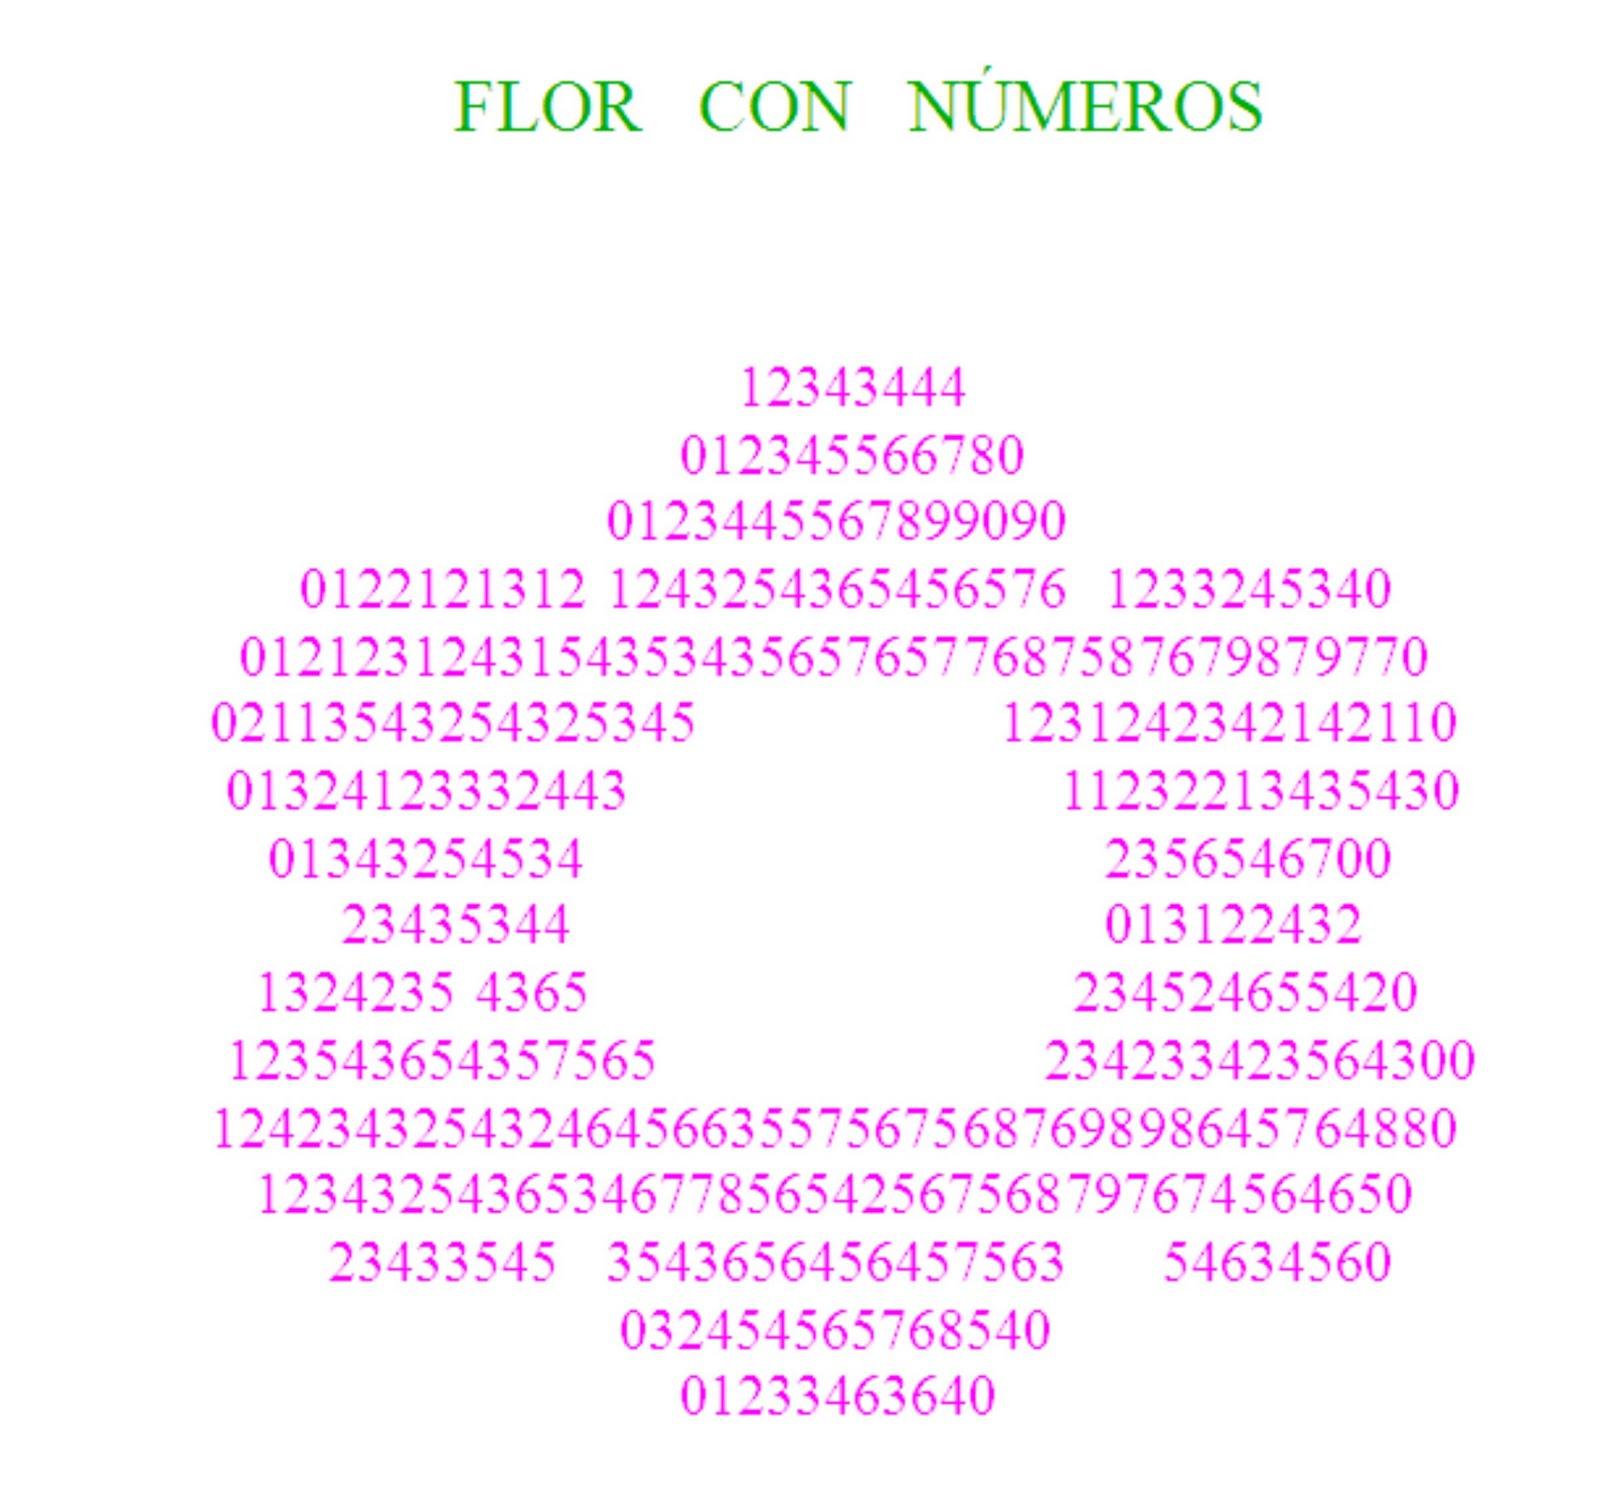 6ºA Curso 2010-2011 CEIP Bilingüe Hernán Cortés: marzo 2011